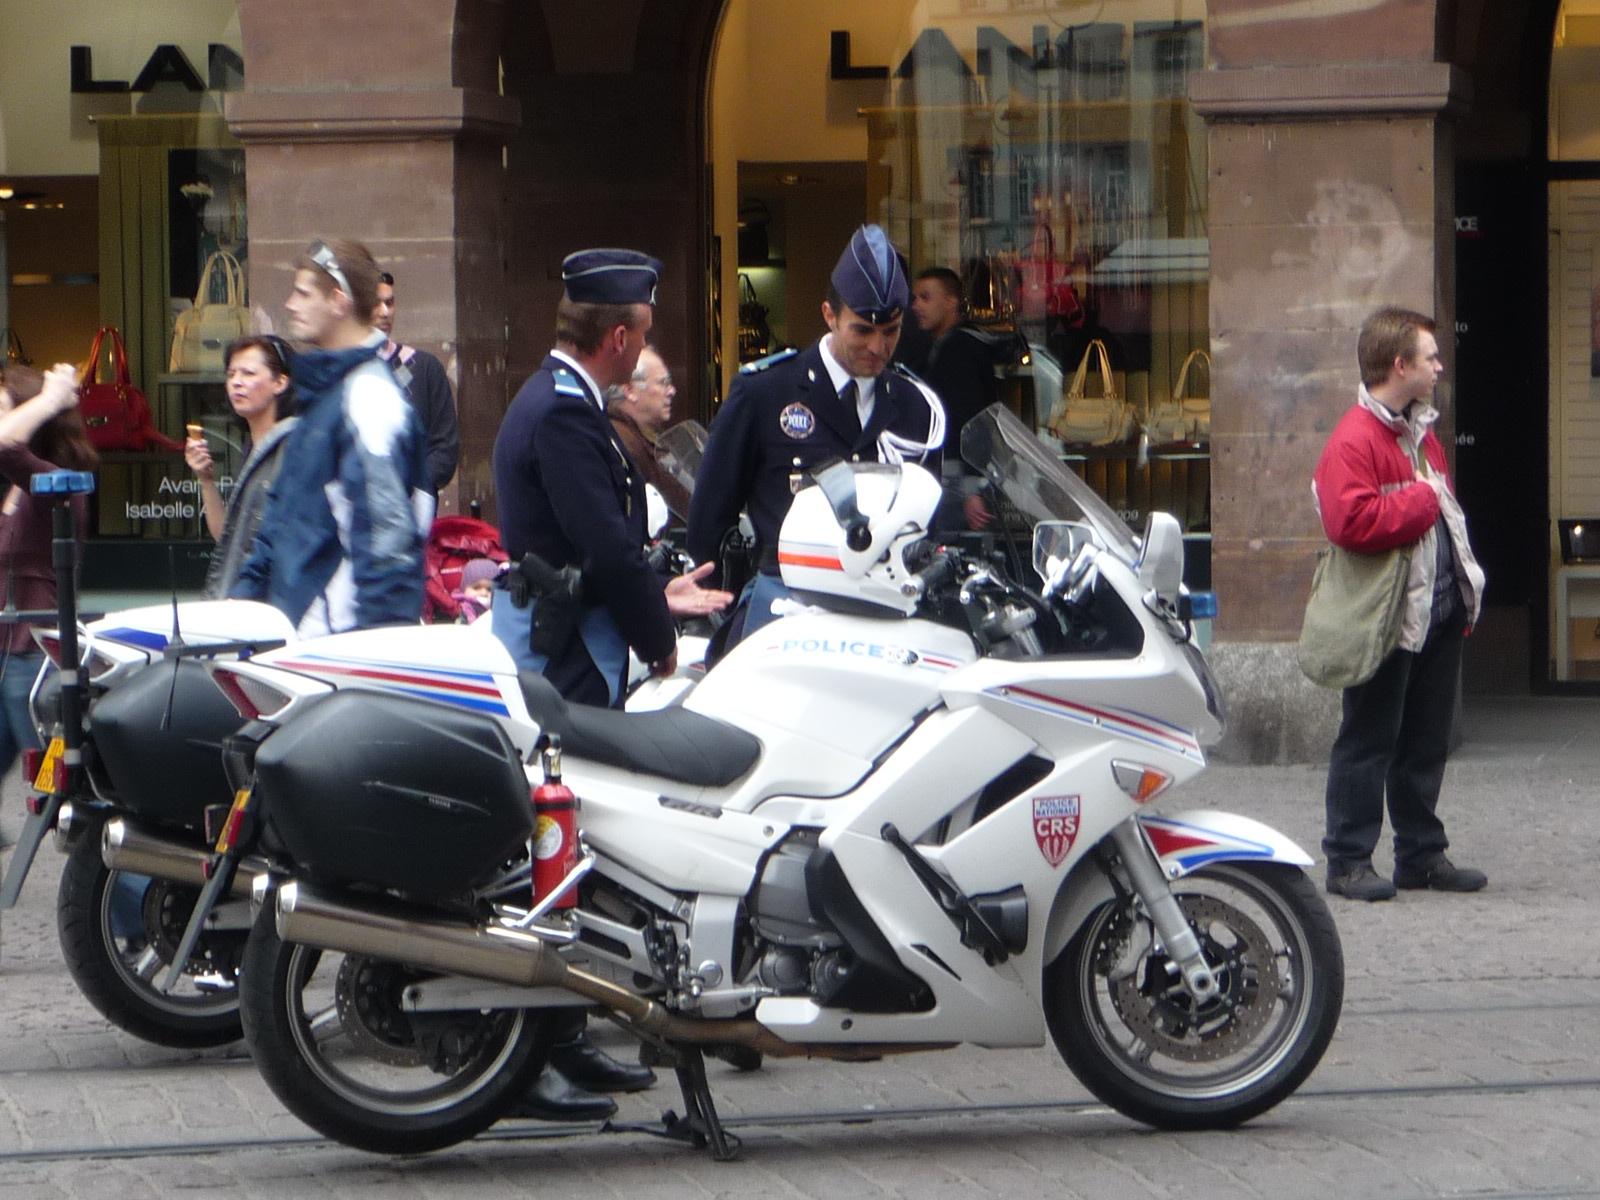 http://4.bp.blogspot.com/_-NpV0kv_j3k/SdZoOsDx7rI/AAAAAAAACf0/ZZPHrgewftM/s1600/police+otan+strasbourg+moto.JPG